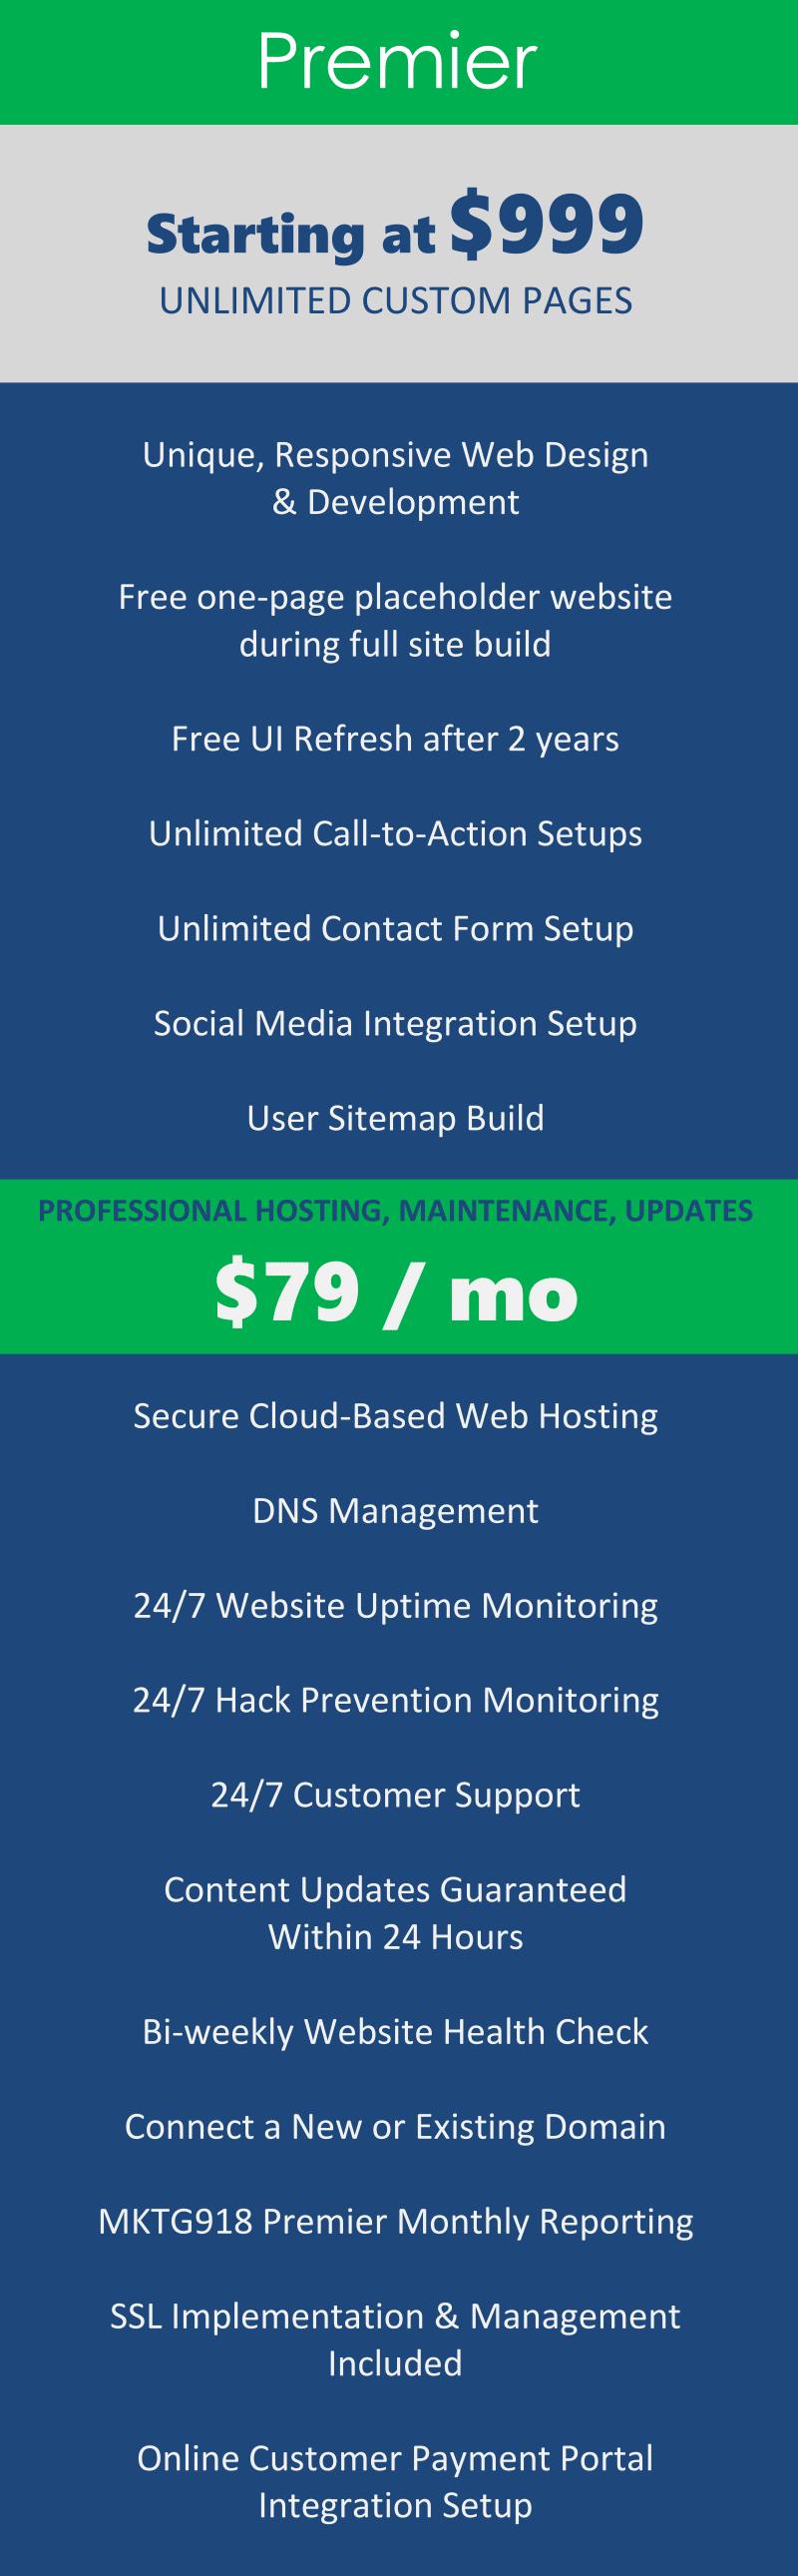 Premier Tulsa Web Design and management Package from MKTG 918